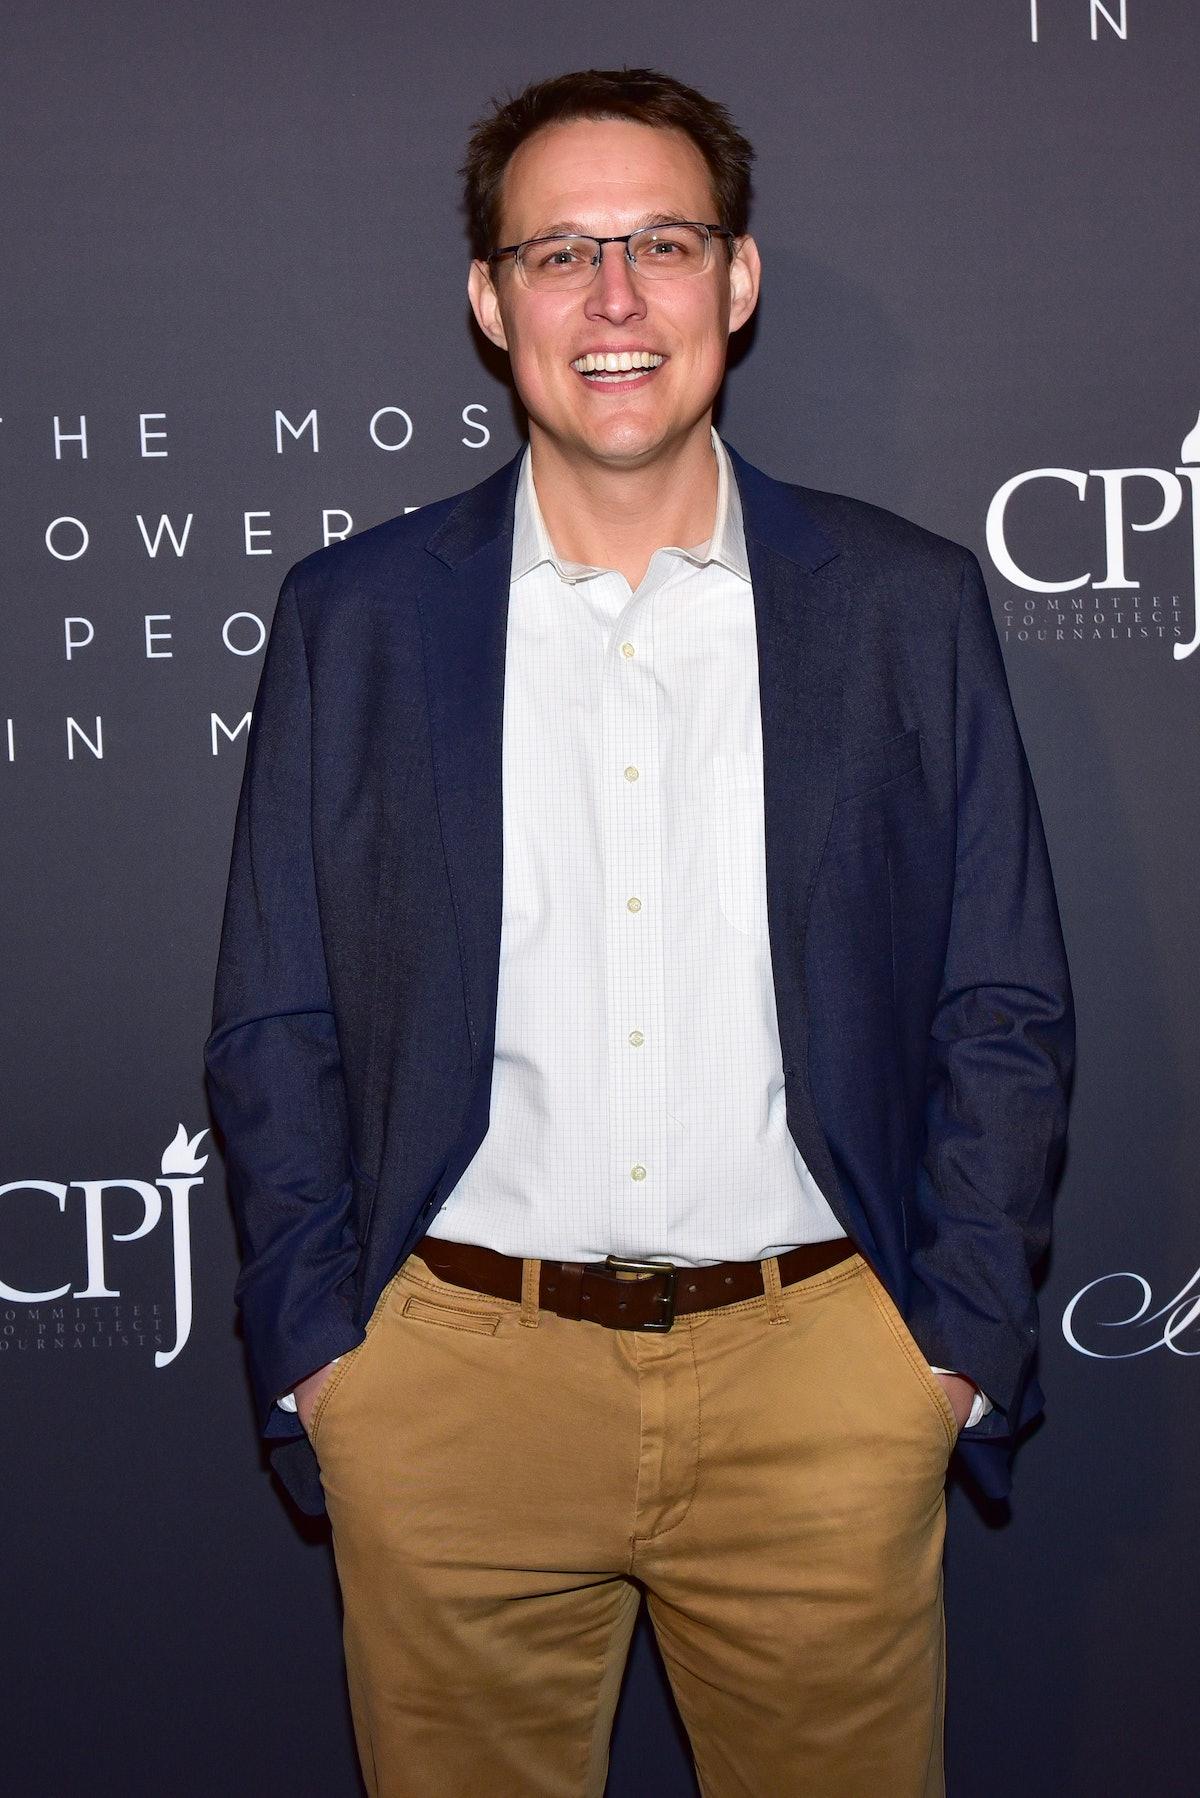 NEW YORK, NEW YORK - APRIL 11: Steve Kornacki attends The Hollywood Reporter Celebrates The Most Pow...